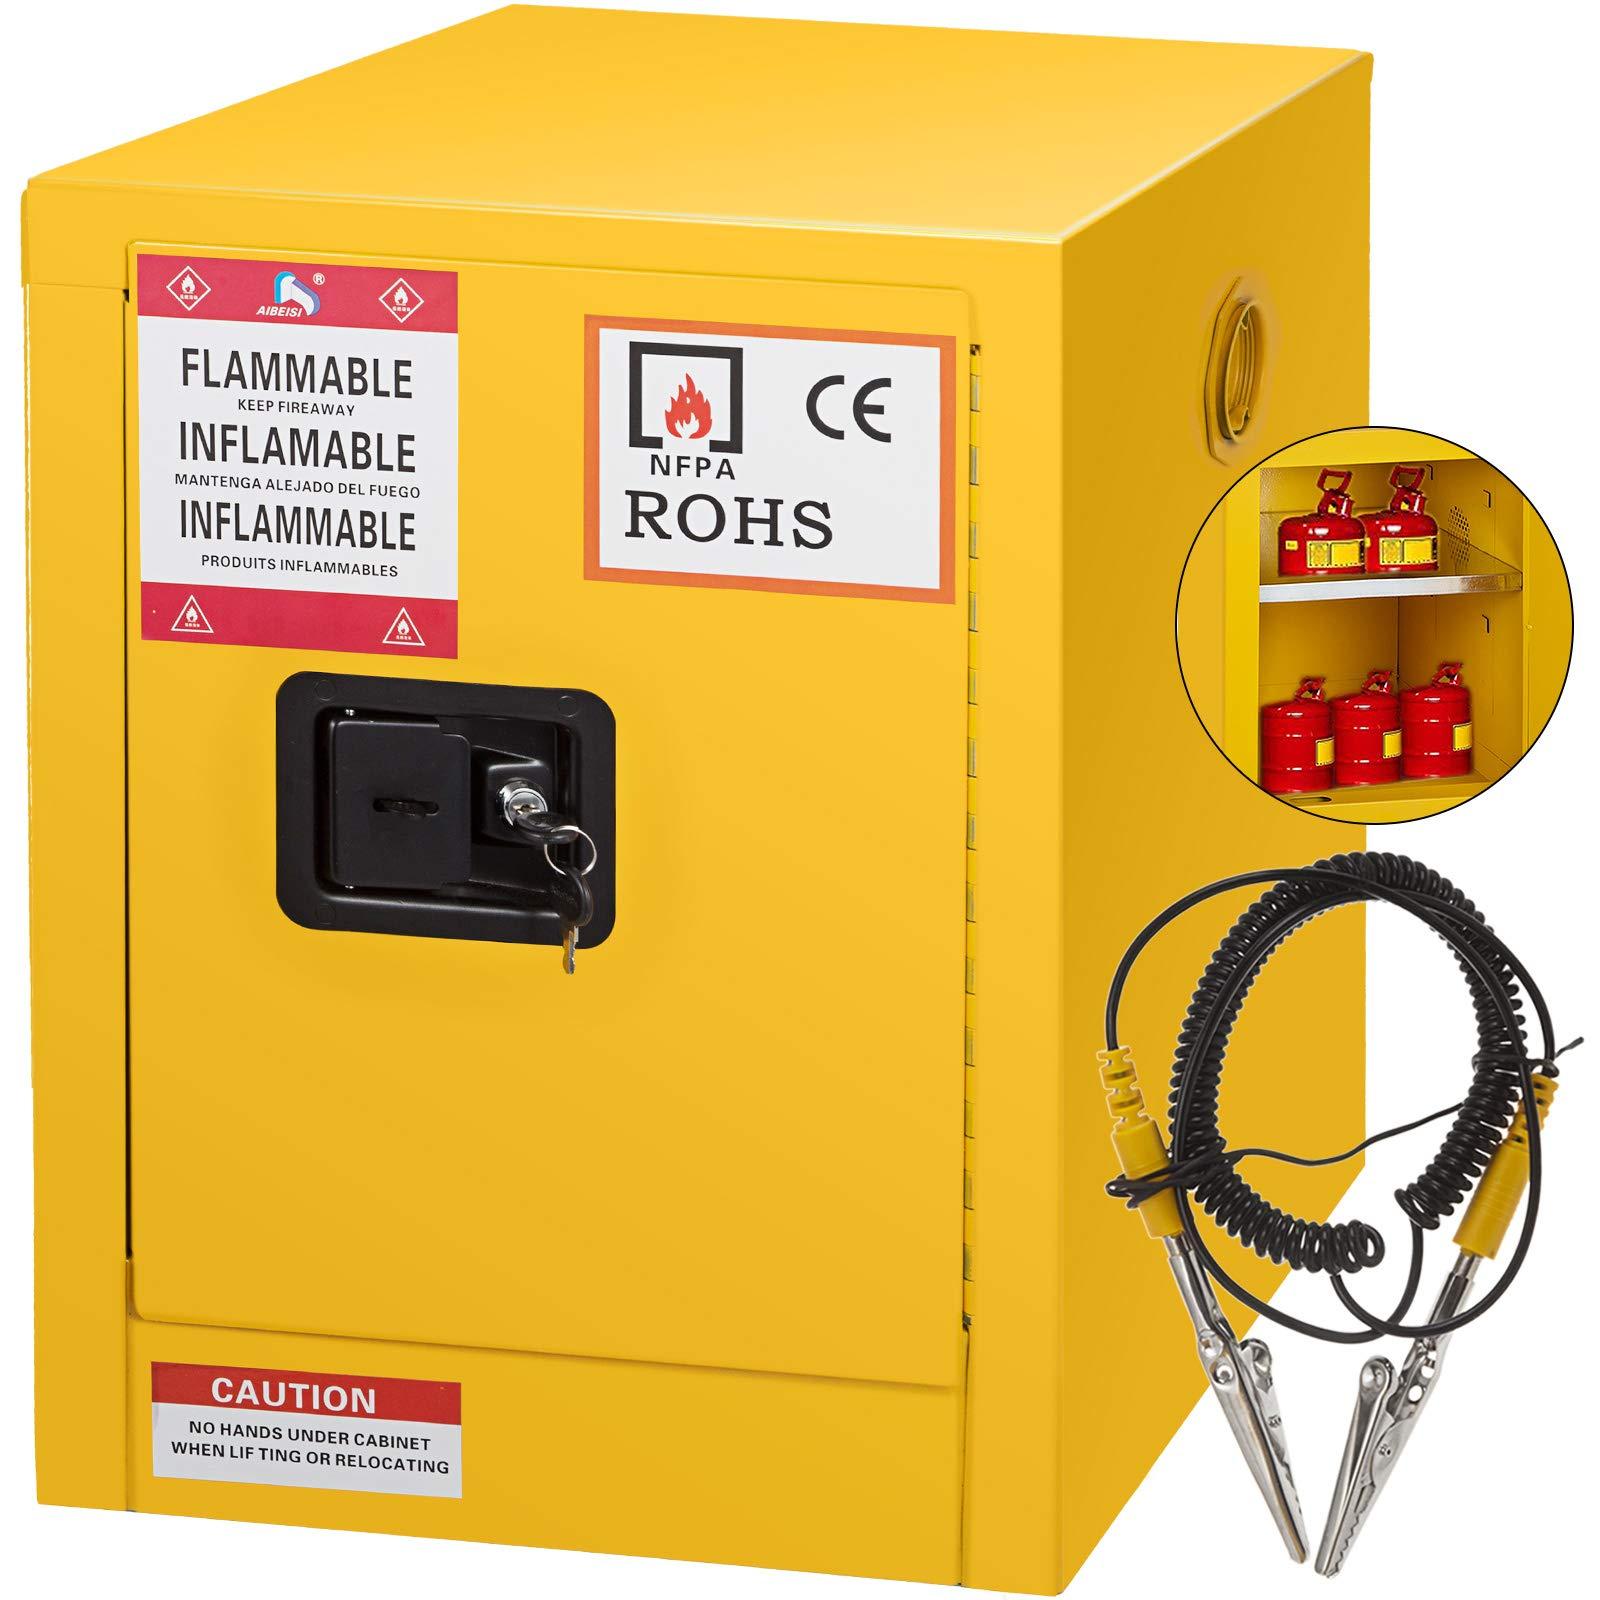 Mophorn Flammable Cabinet Galvanized Steel 1 Door Safety Cabinet 4 Gallon 17'' Length x 22'' Height x 17'' Width Adjustable Shelf Flammable Storage Cabinet for Flammable Liquids (17'' x 22'' x 17'', Yellow)